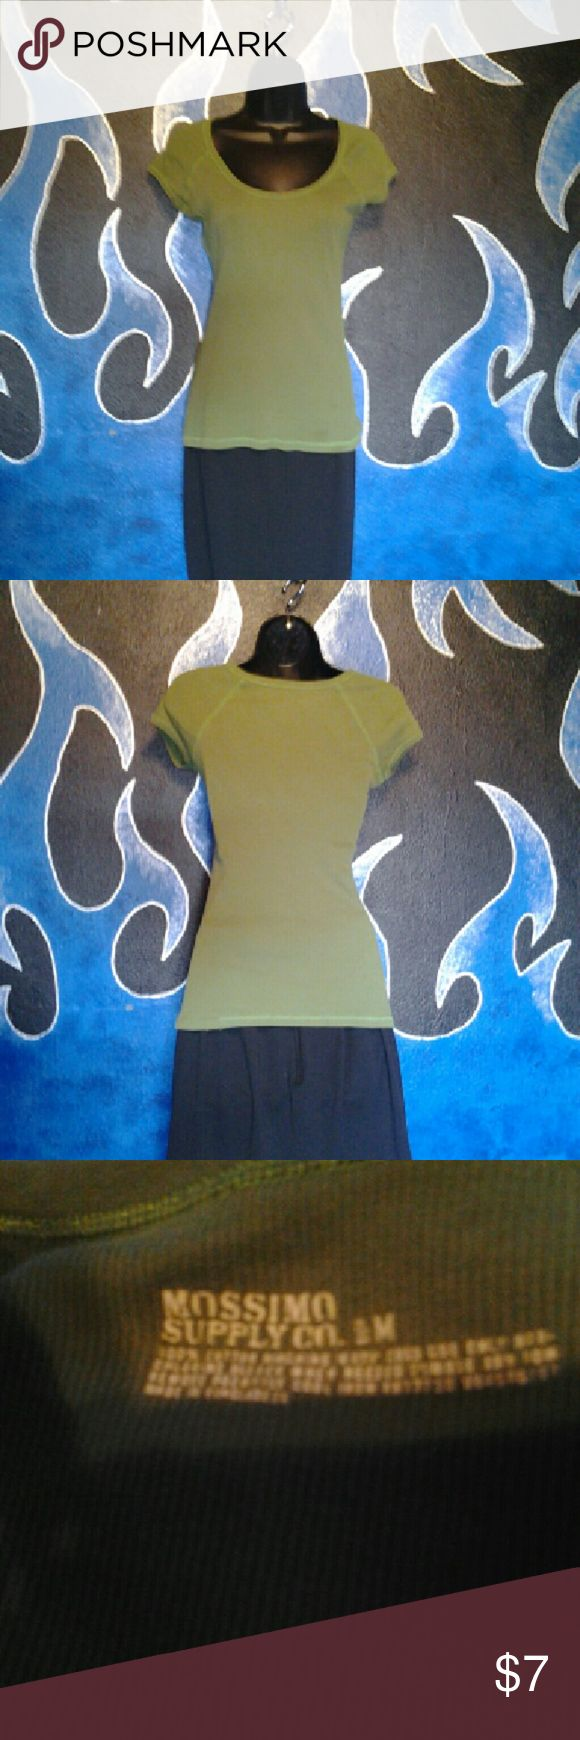 Mossimo supply co size medium Mossimo supply co size medium green shirt Mossimo Supply Co Tops Blouses